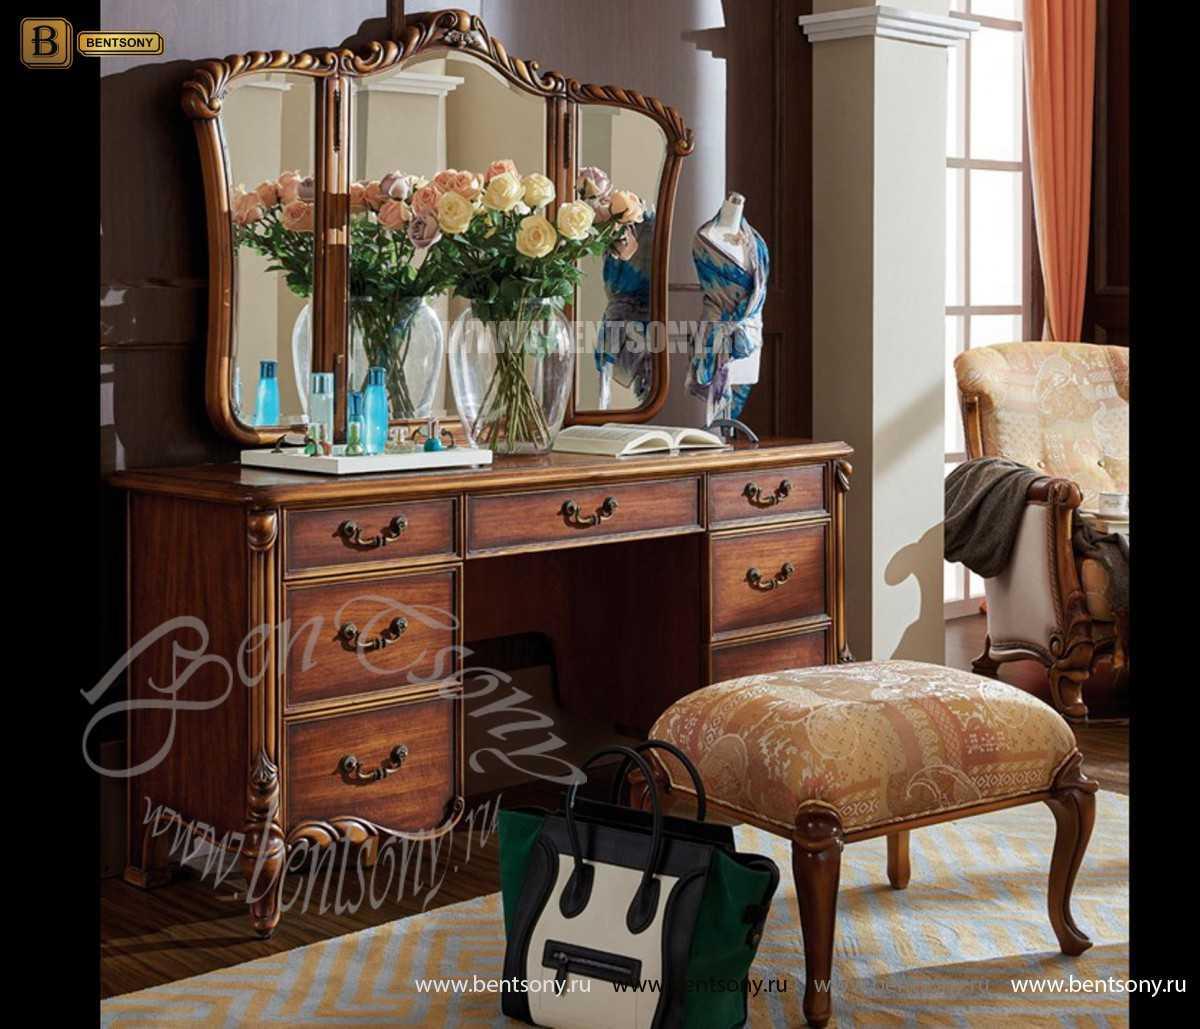 Спальня Лоренс А (Классика, Ткань) для квартиры